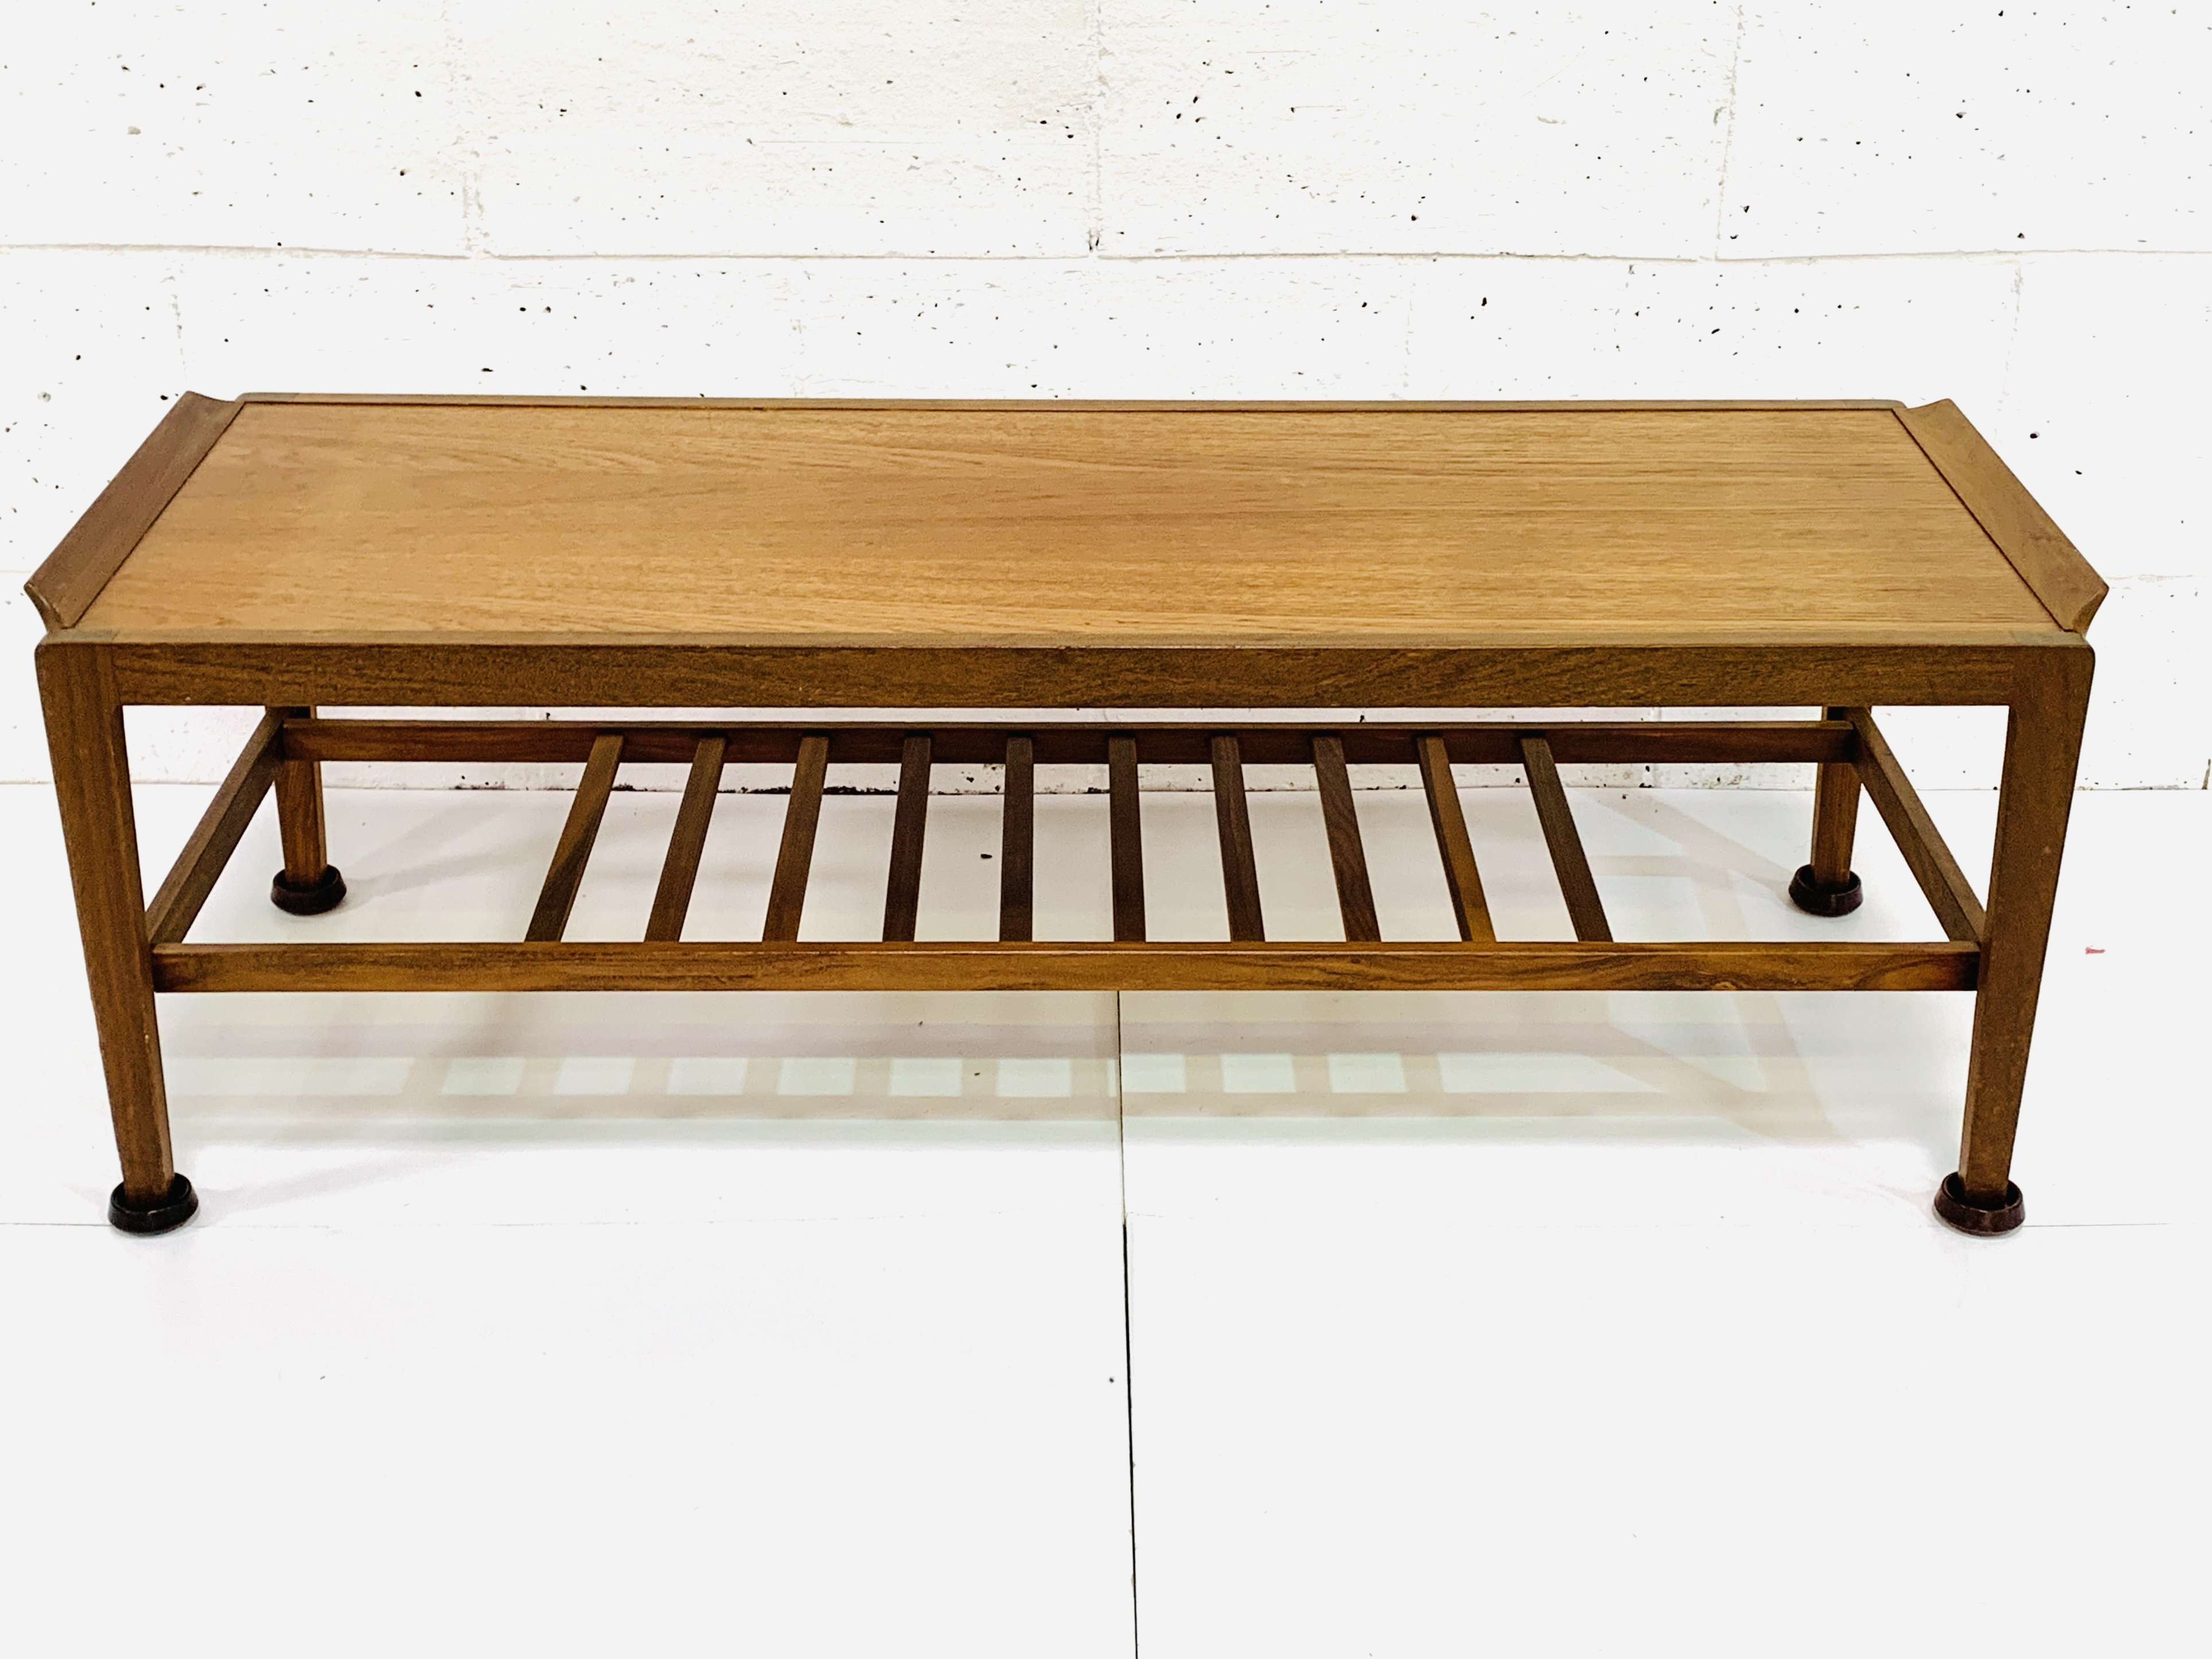 Teak coffee table with newspaper rack under - Image 2 of 4